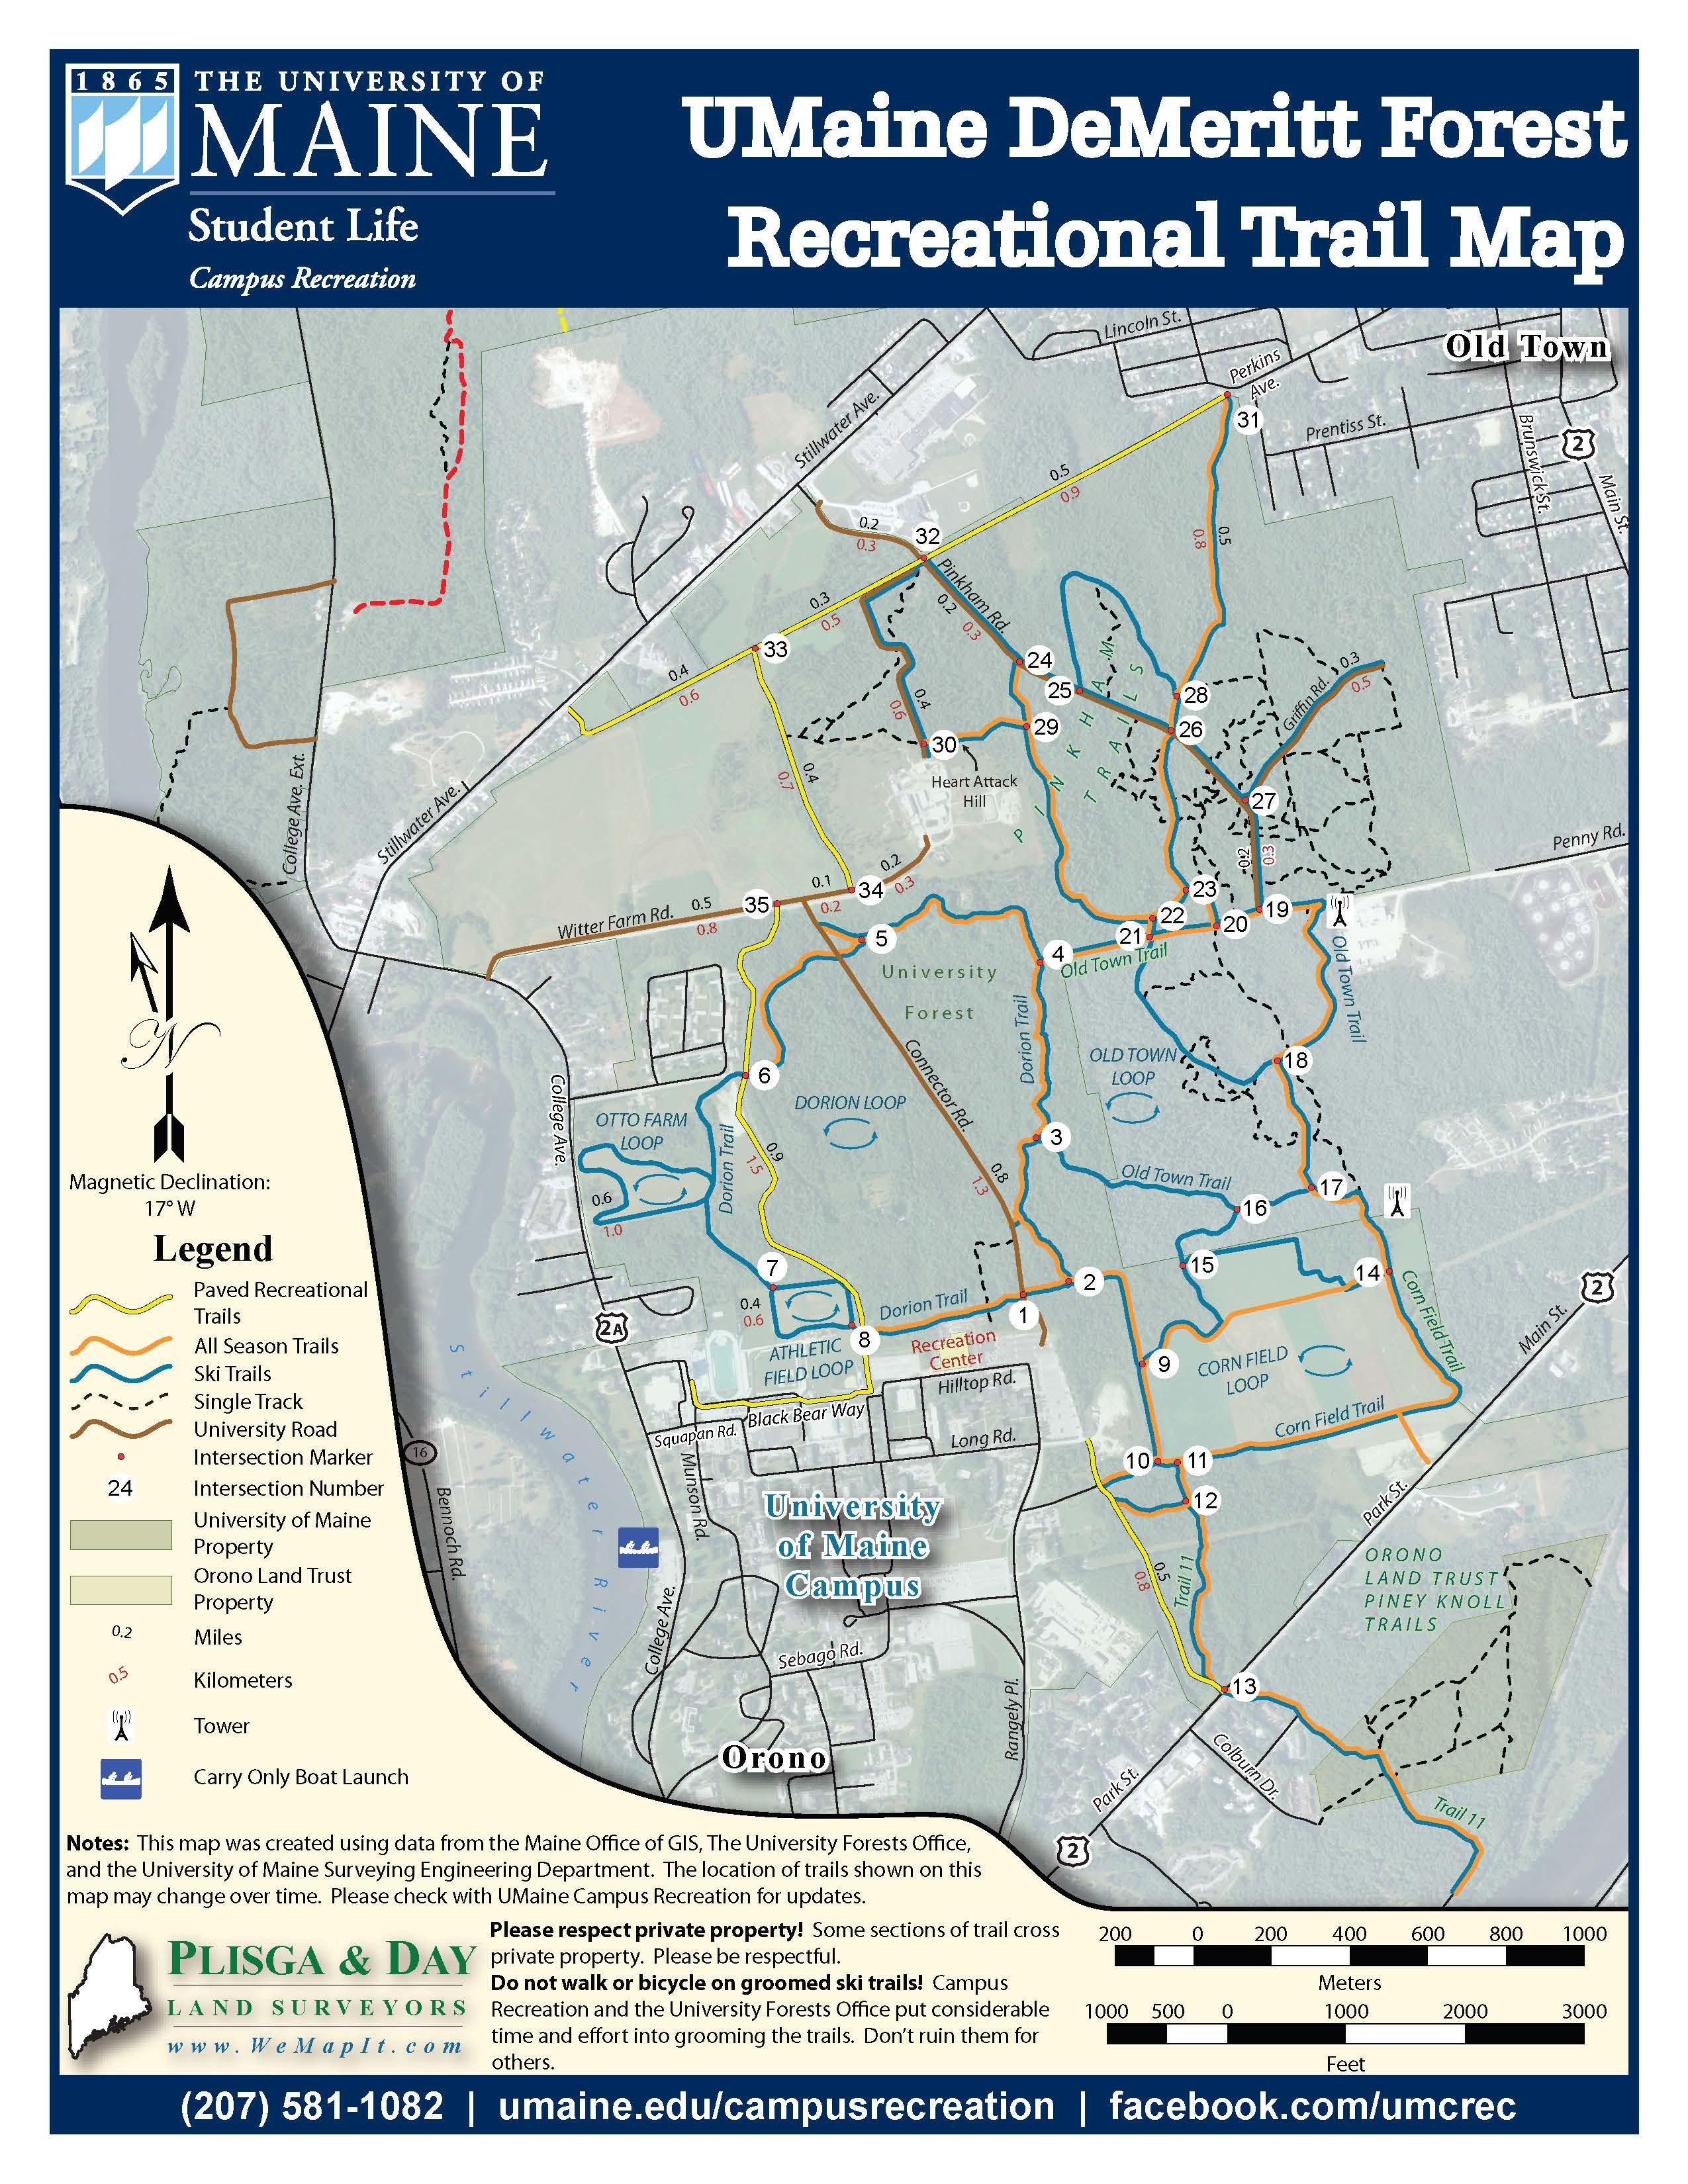 Umaine Campus Map Pdf.Demeritt Forest Trail System Campus Recreation University Of Maine